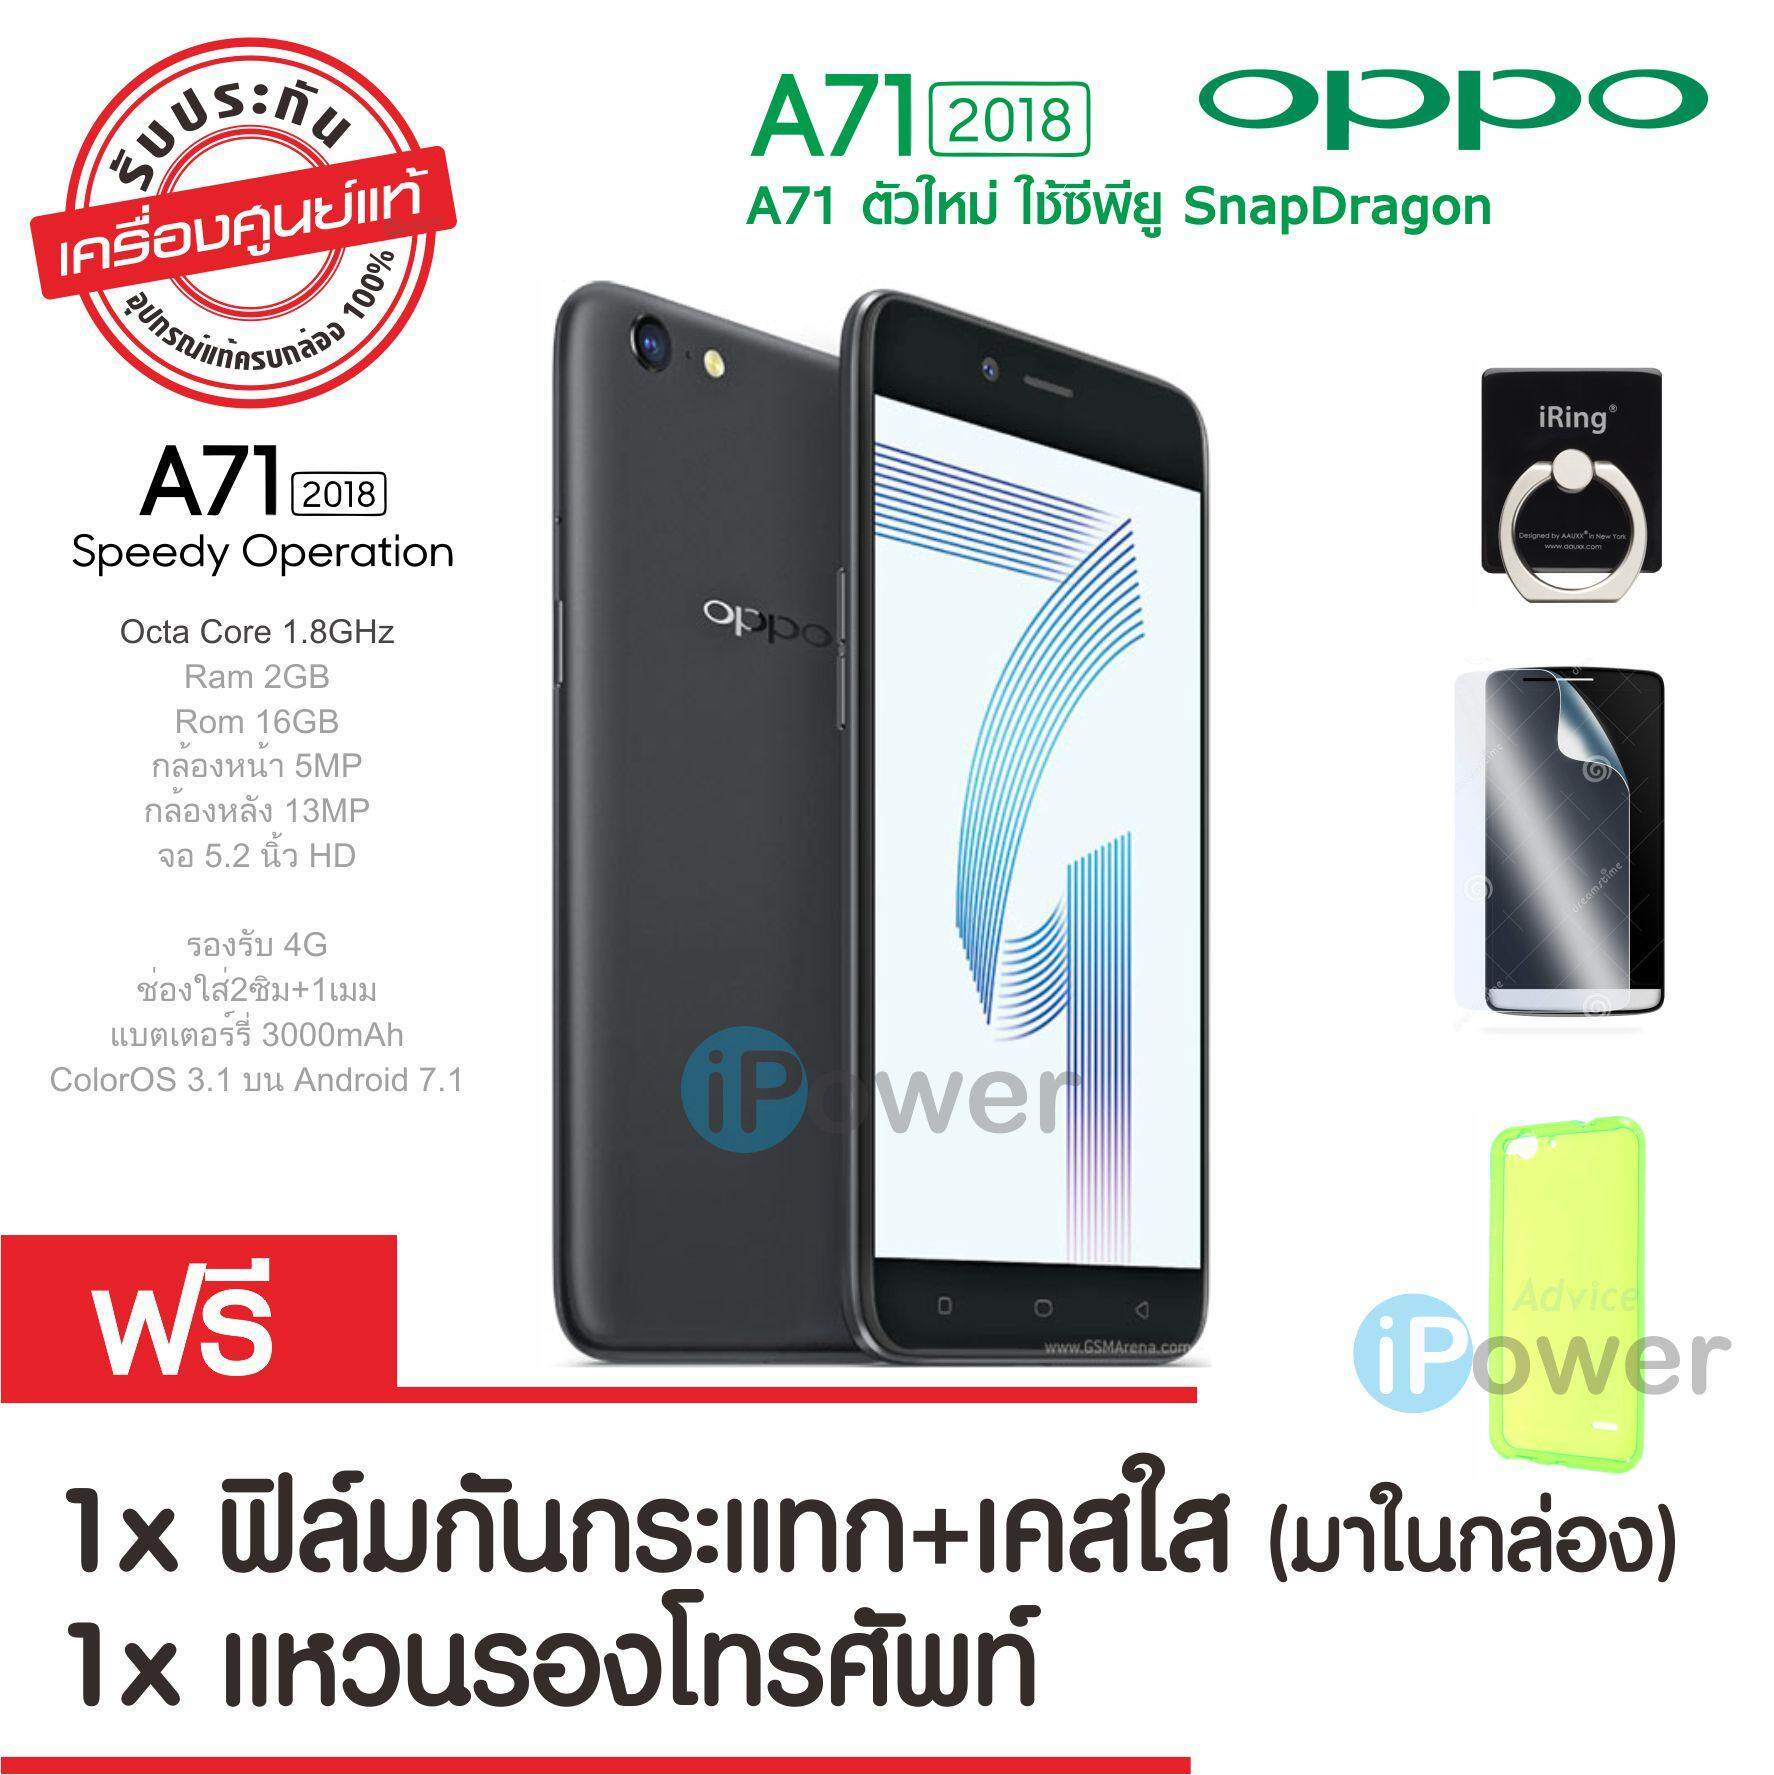 OPPO A71 2018 ( ออปโป้ A71 2018 ) 4G LTE.(Black) เครื่องใหม่ เครื่องแท้ รับประกันศูนย์ แถมฟรีฟิล์มกันกระแทกติดเครื่อง+เคสใส+Ring Holder (แหวนจับโทรศัพท์)